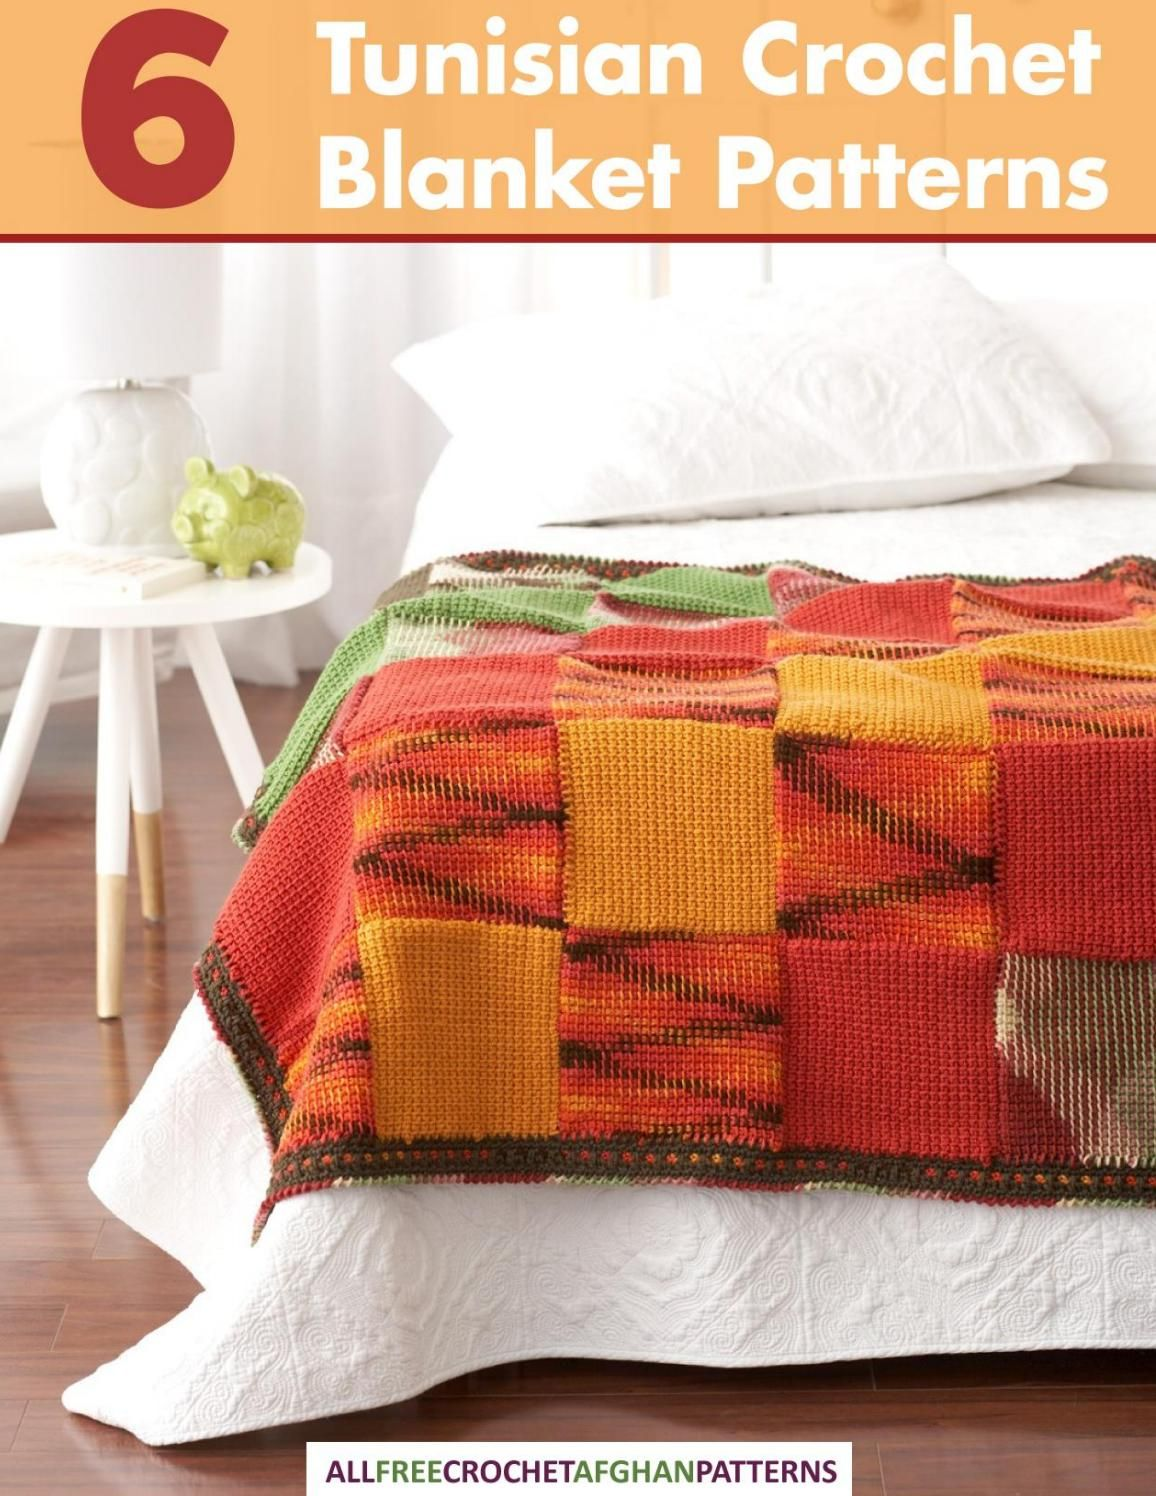 6 tunisian crochet blanket patterns free ebook